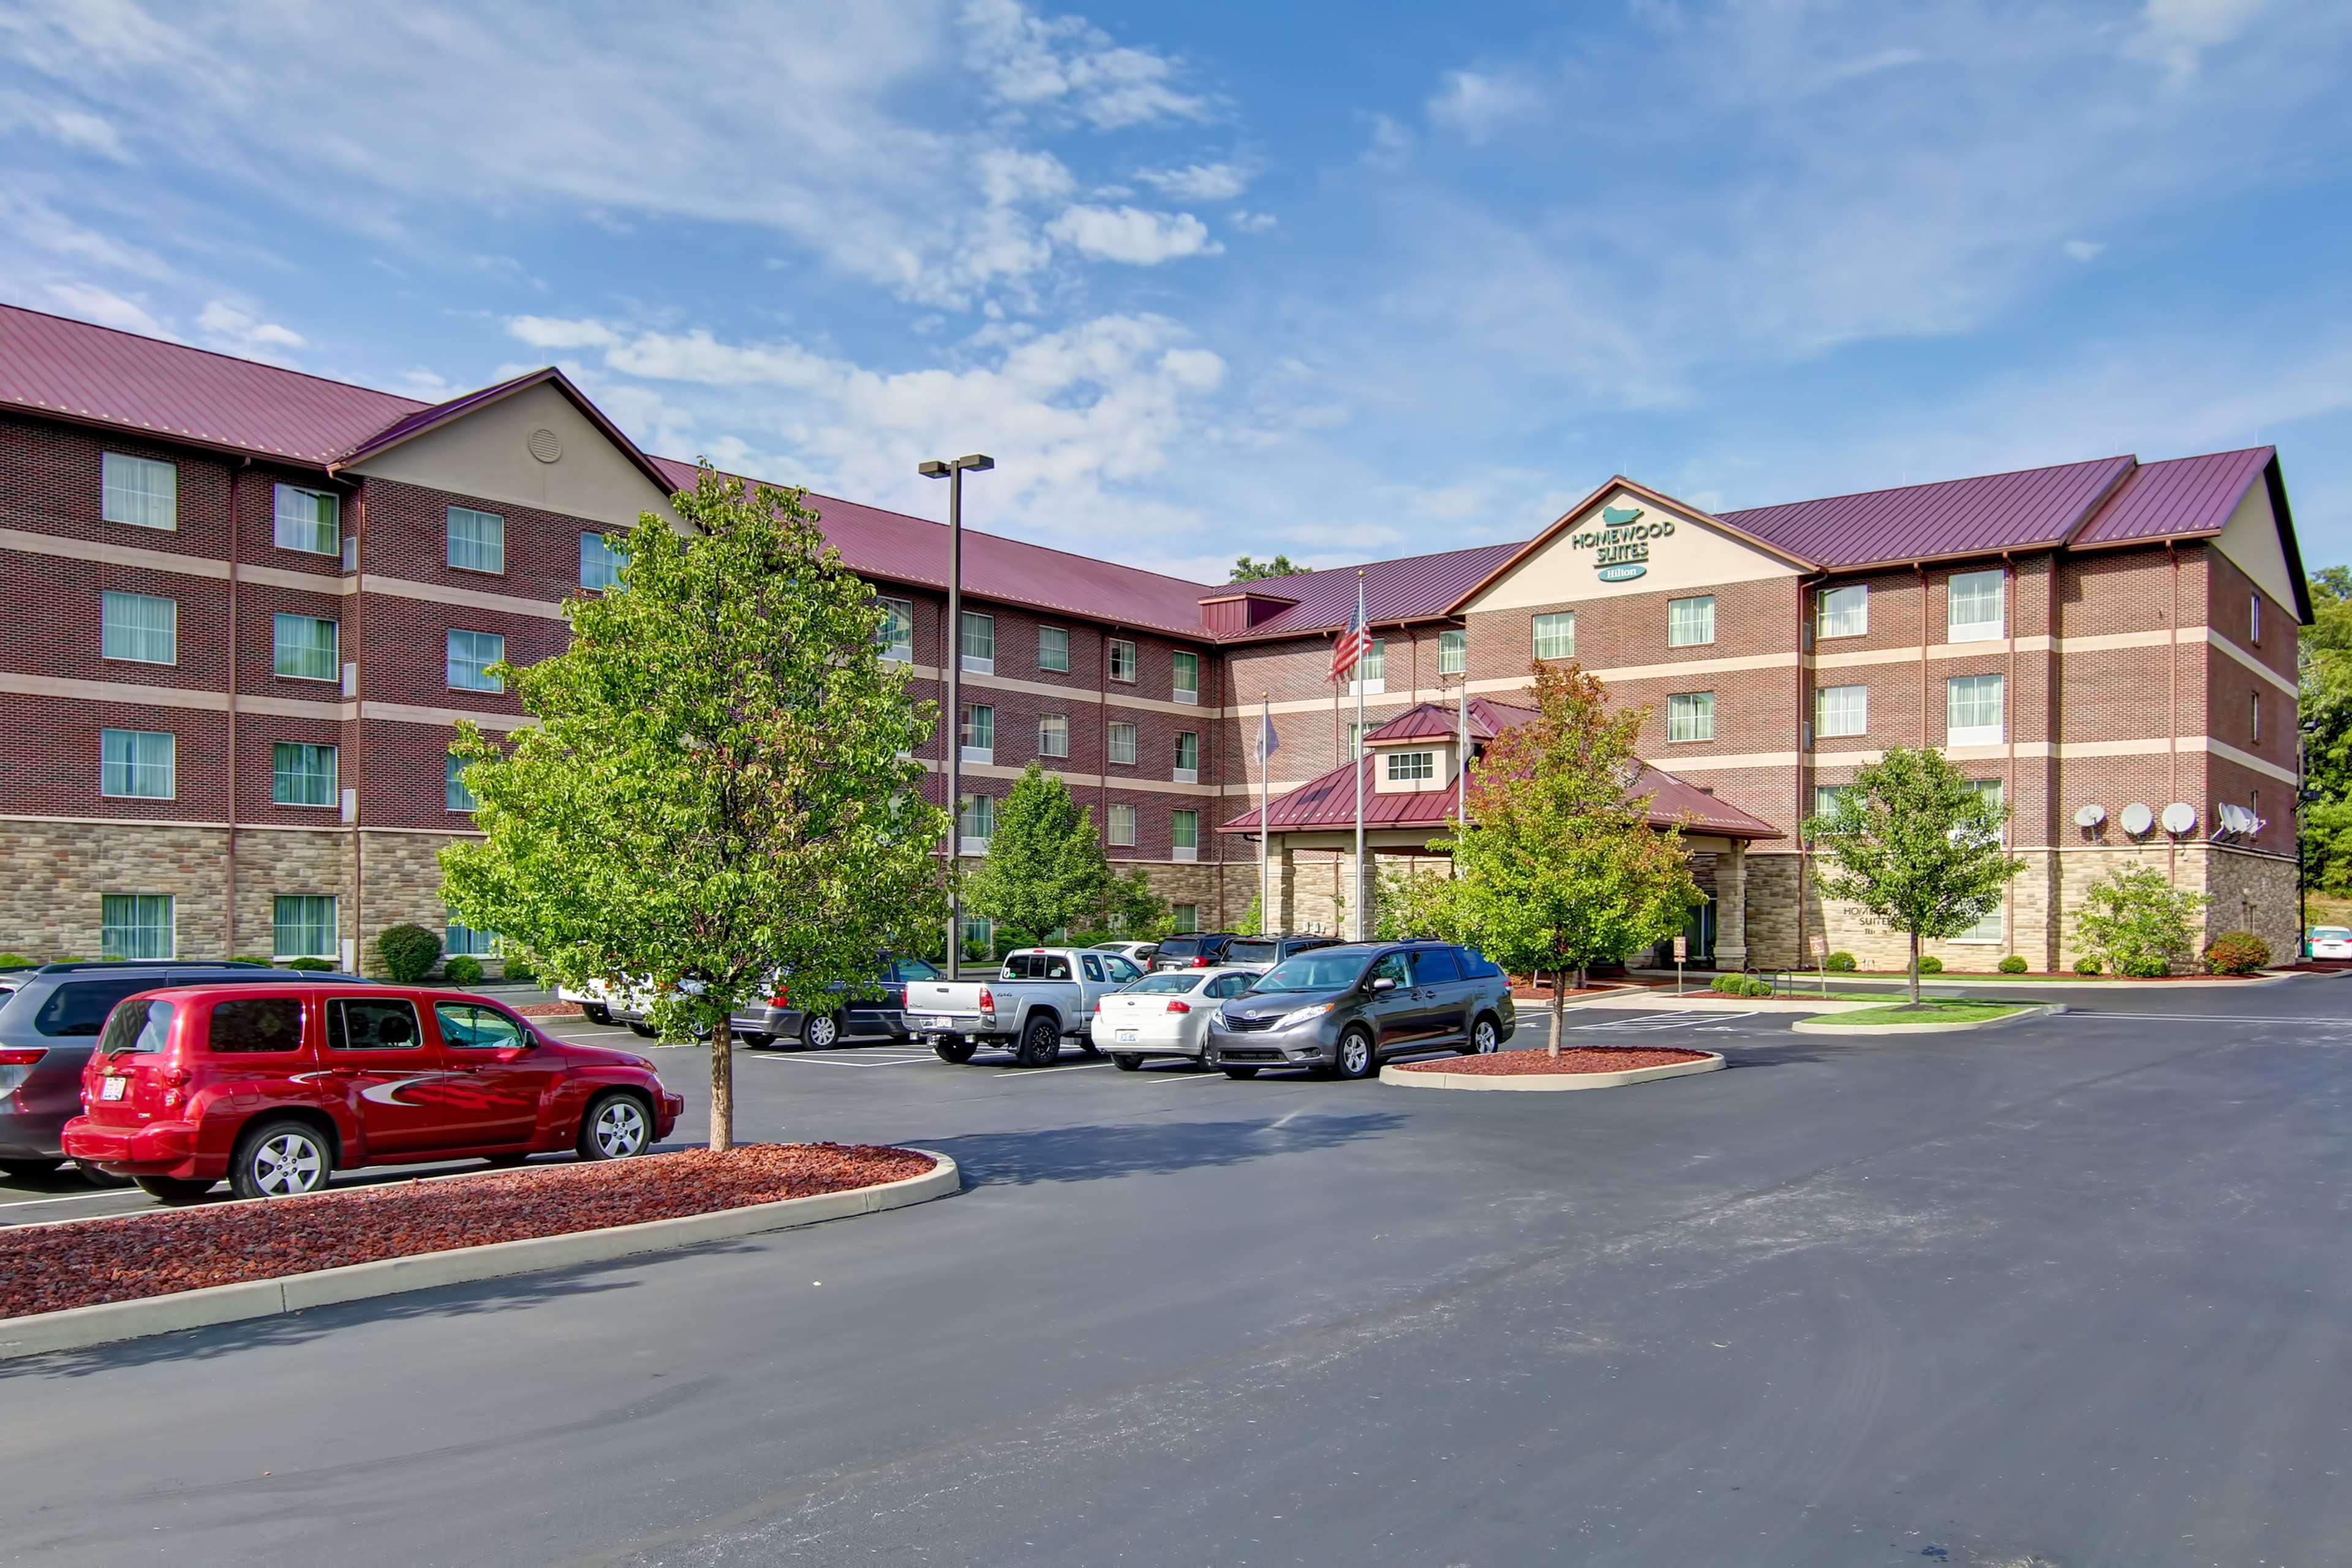 Homewood Suites by Hilton Cincinnati Airport South-Florence image 0